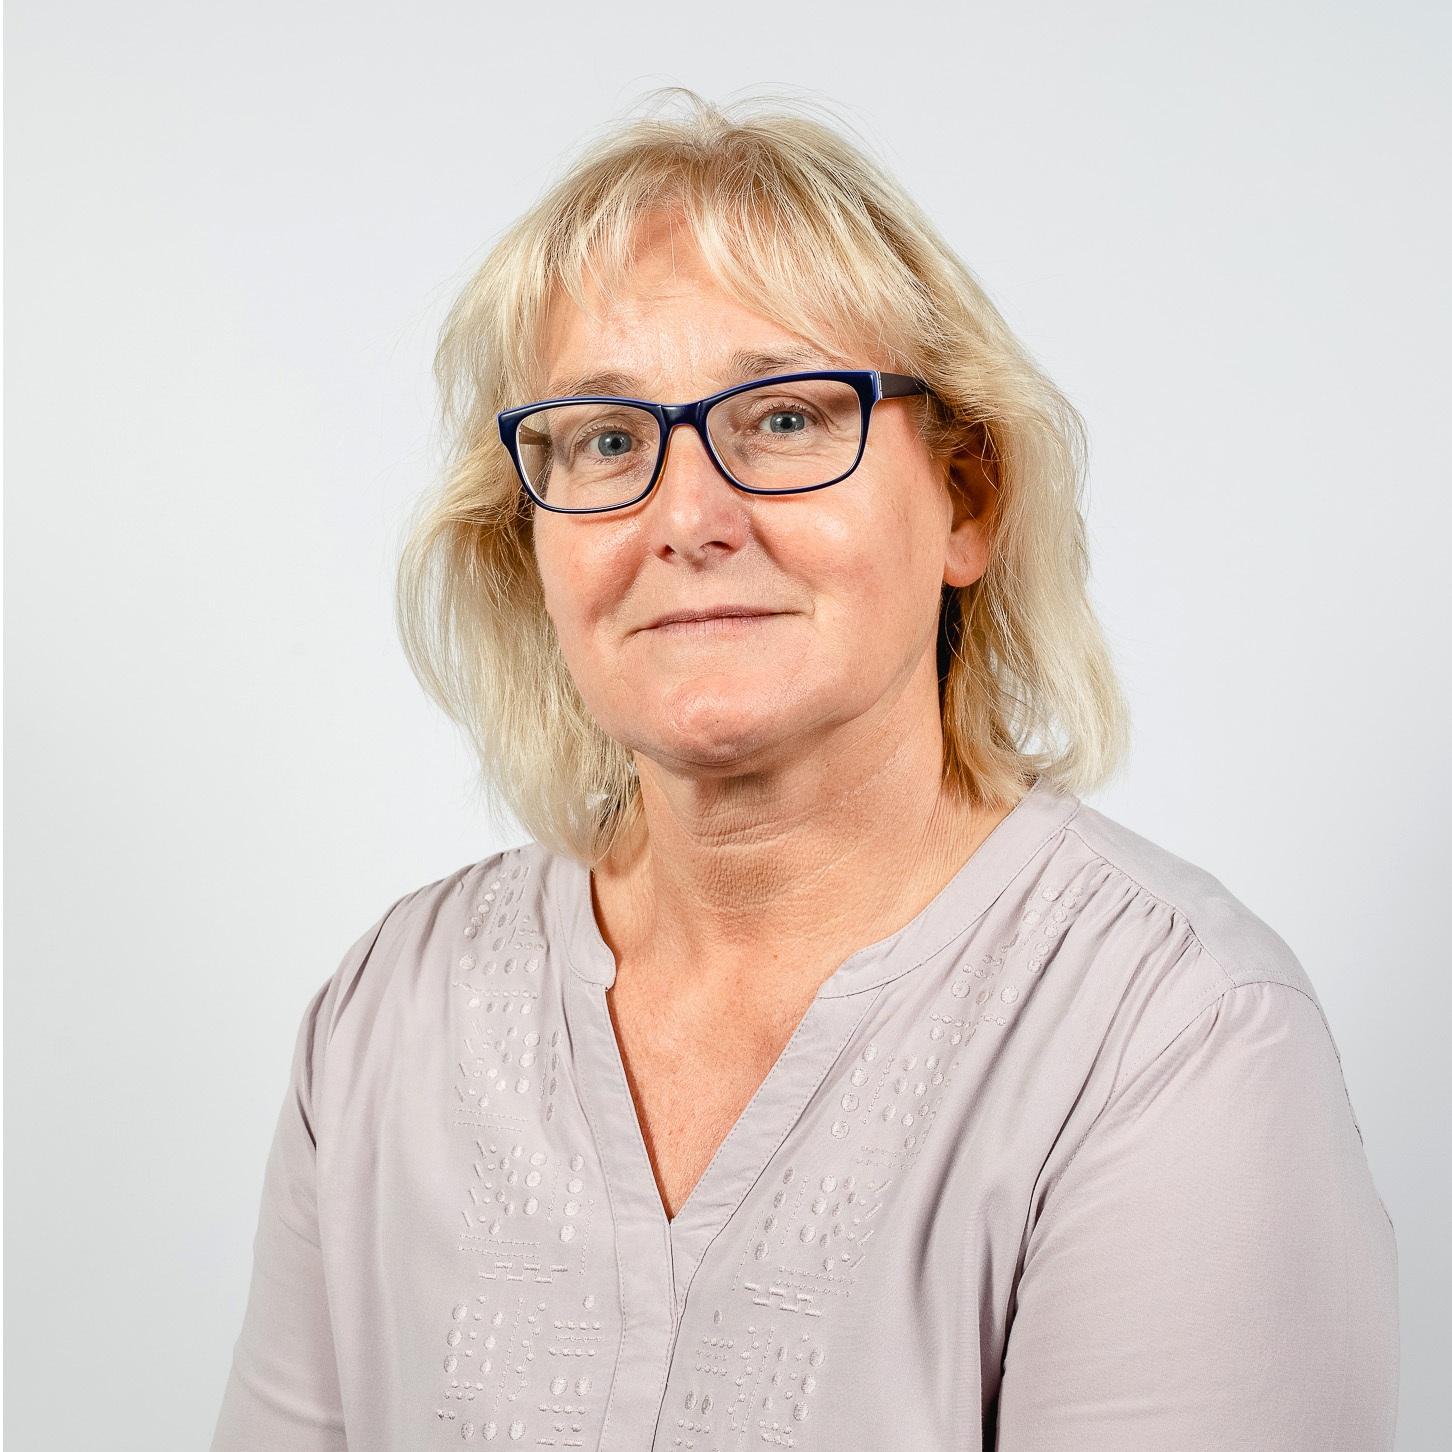 Elke Dammeyer